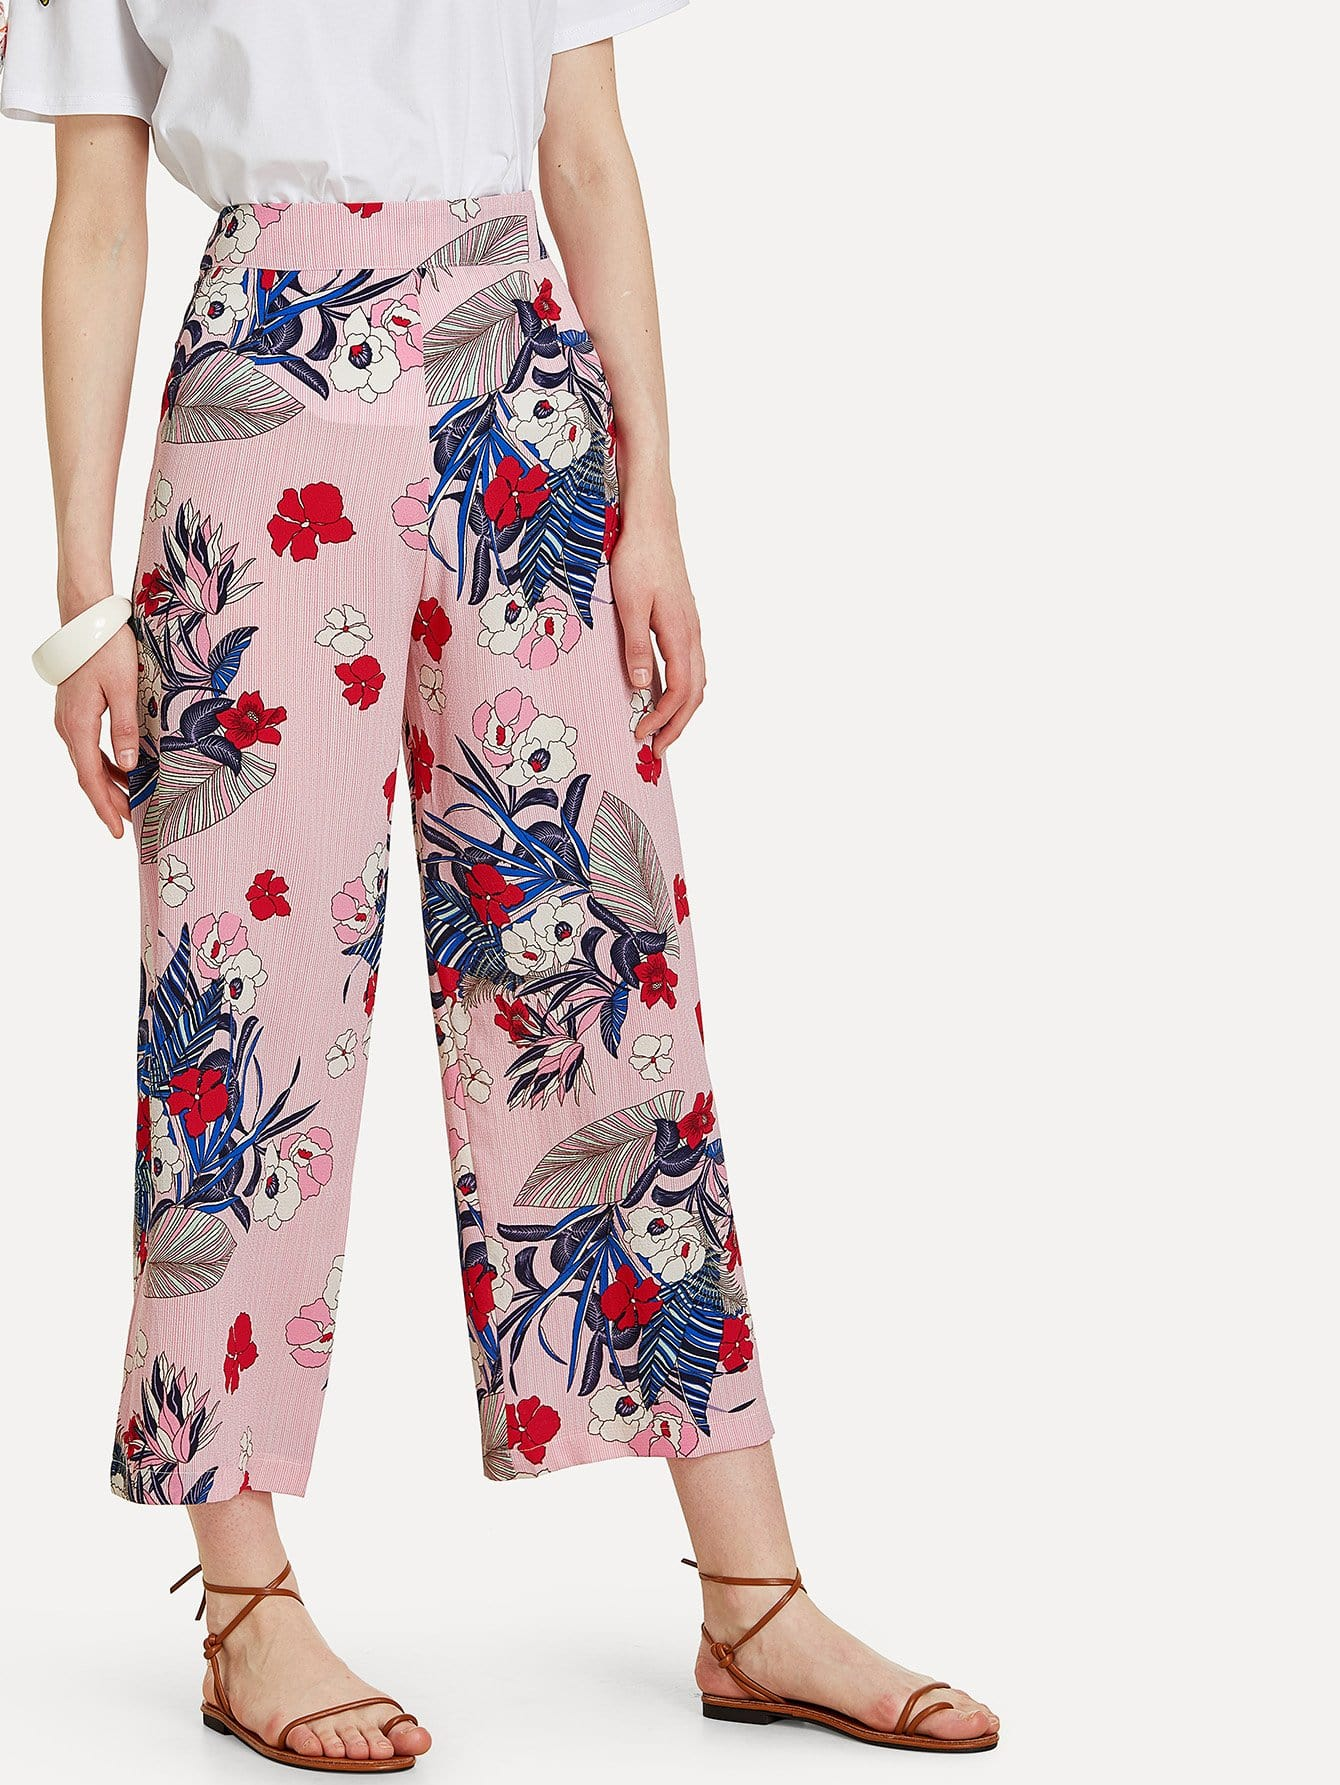 Tropical & Stripe Print Culotte Pants spot culotte pants